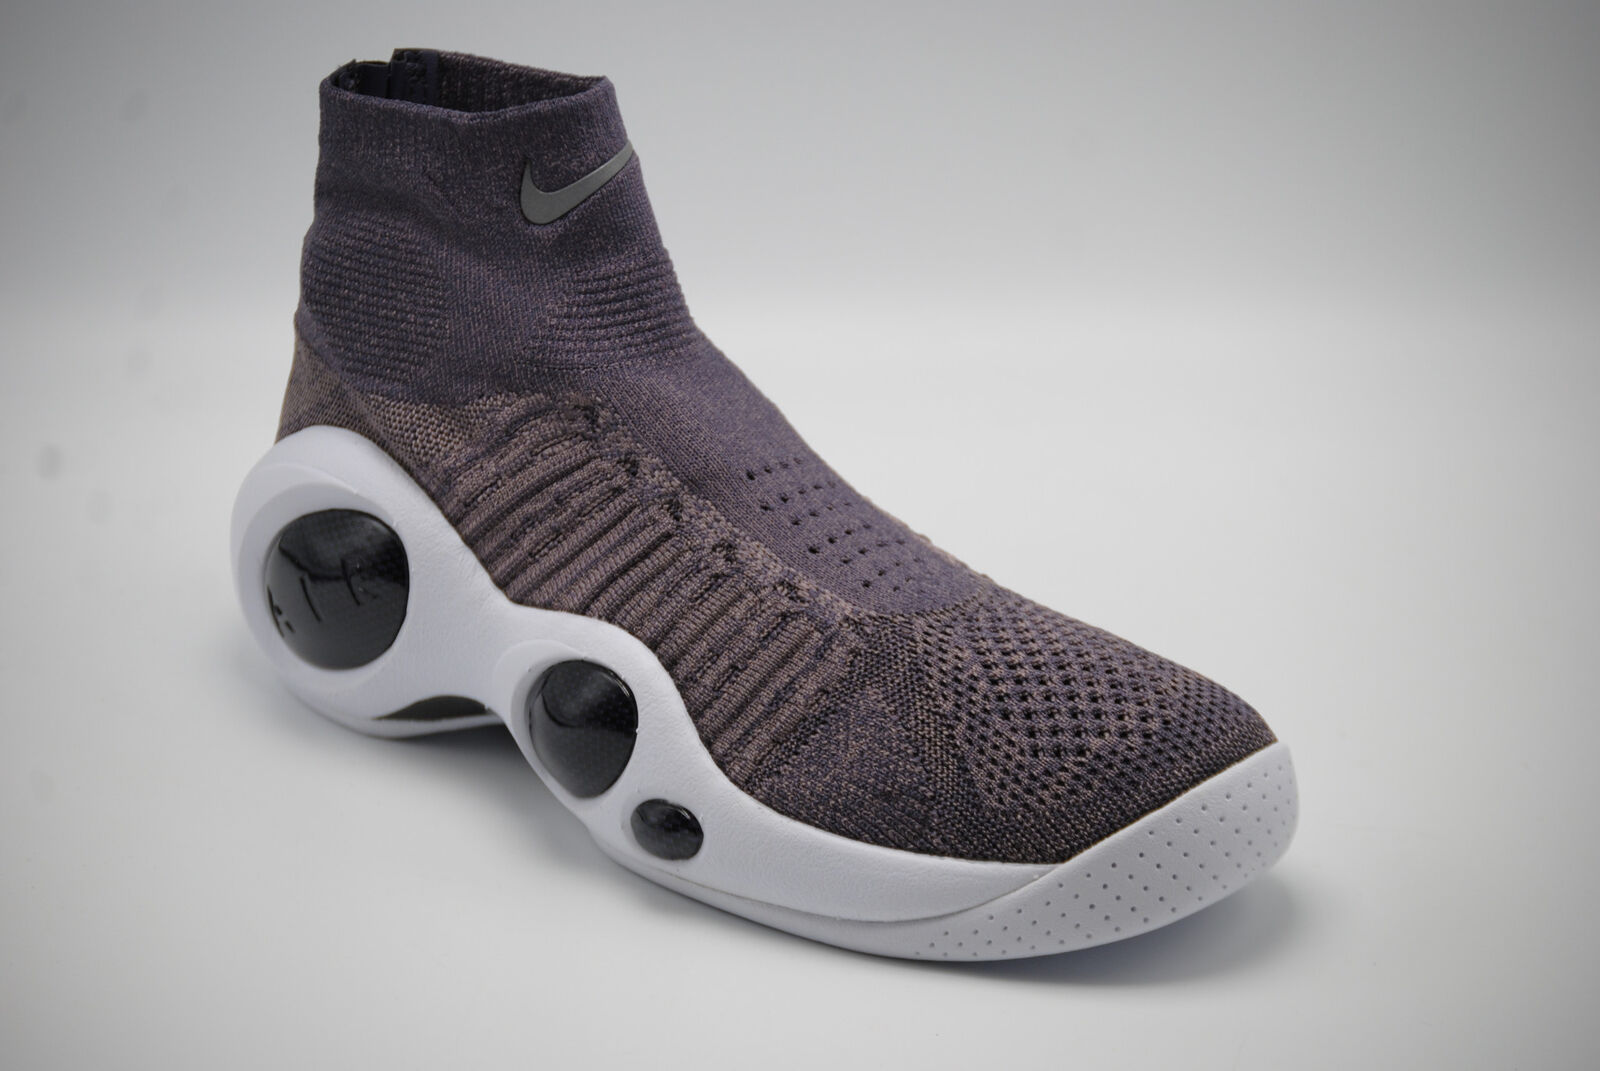 daf6cff342b2 Nike Flight Bonafide Men s Basketball Shoes A01745 003 Size 10 NWB ...